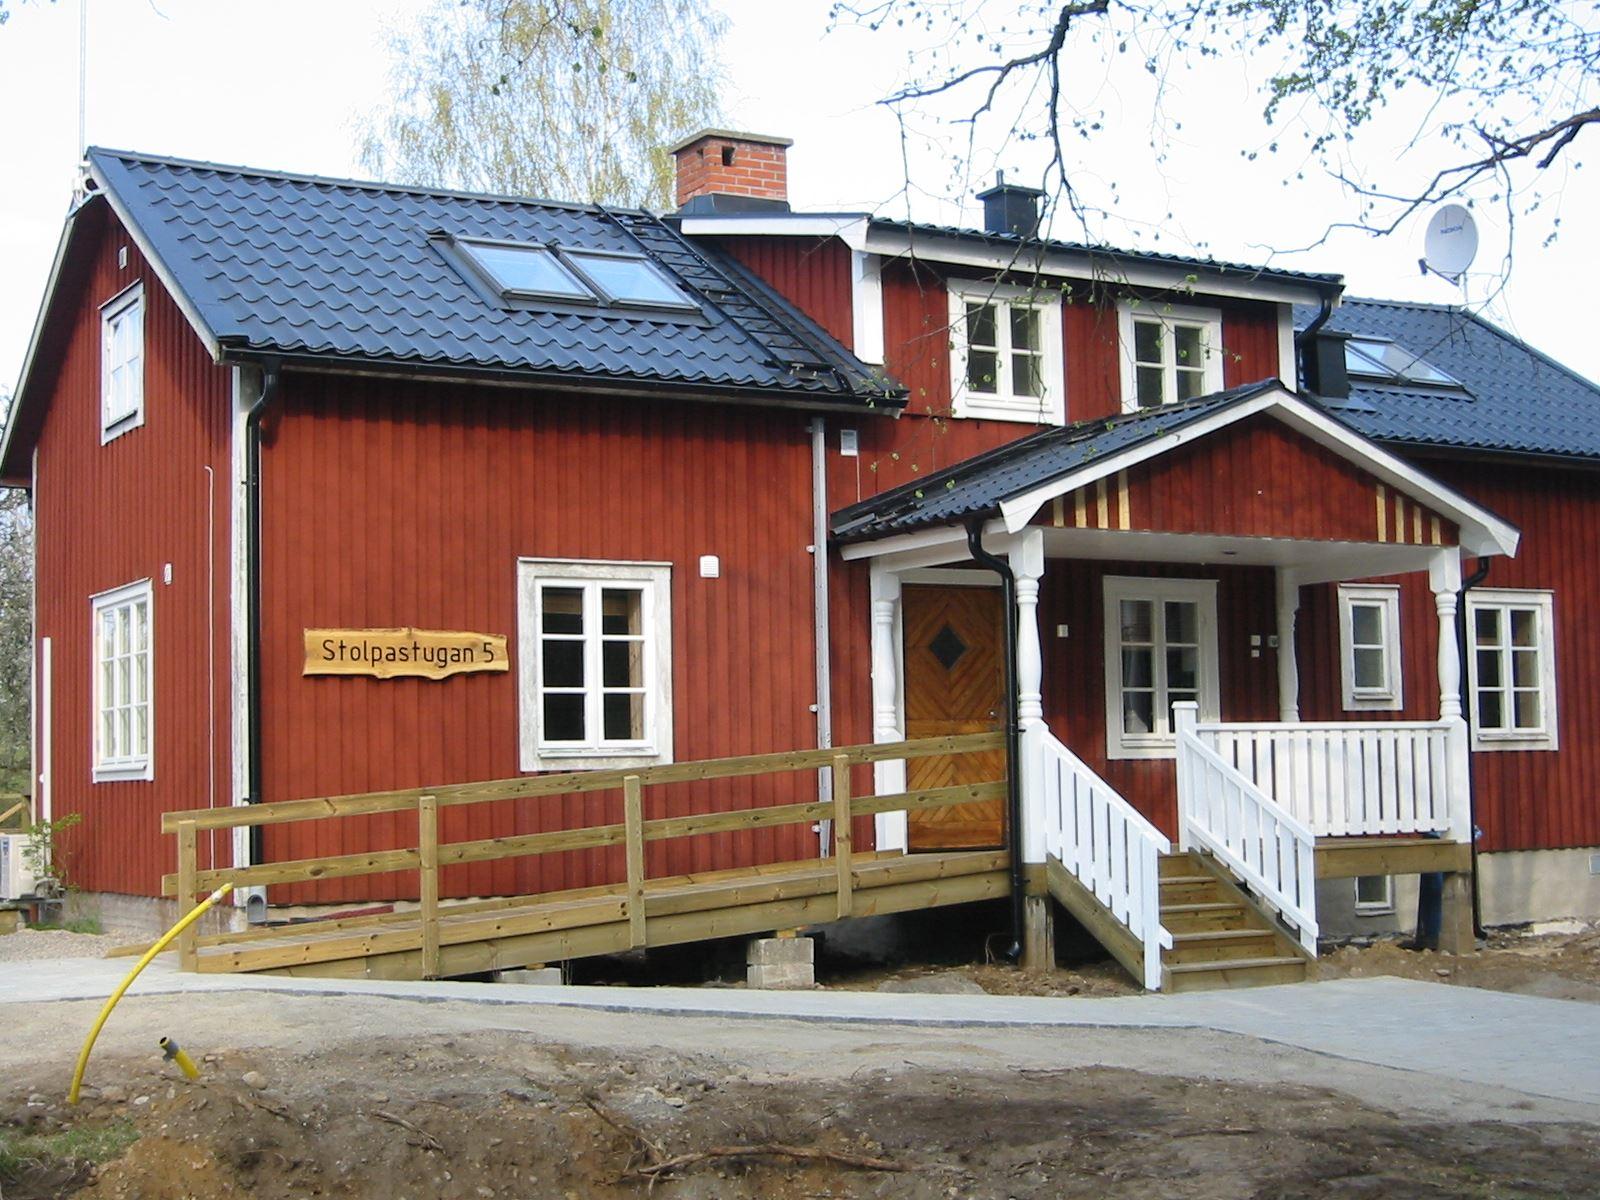 "Cottage 23 ""Stolpastugan 5"" - Ove Varland"